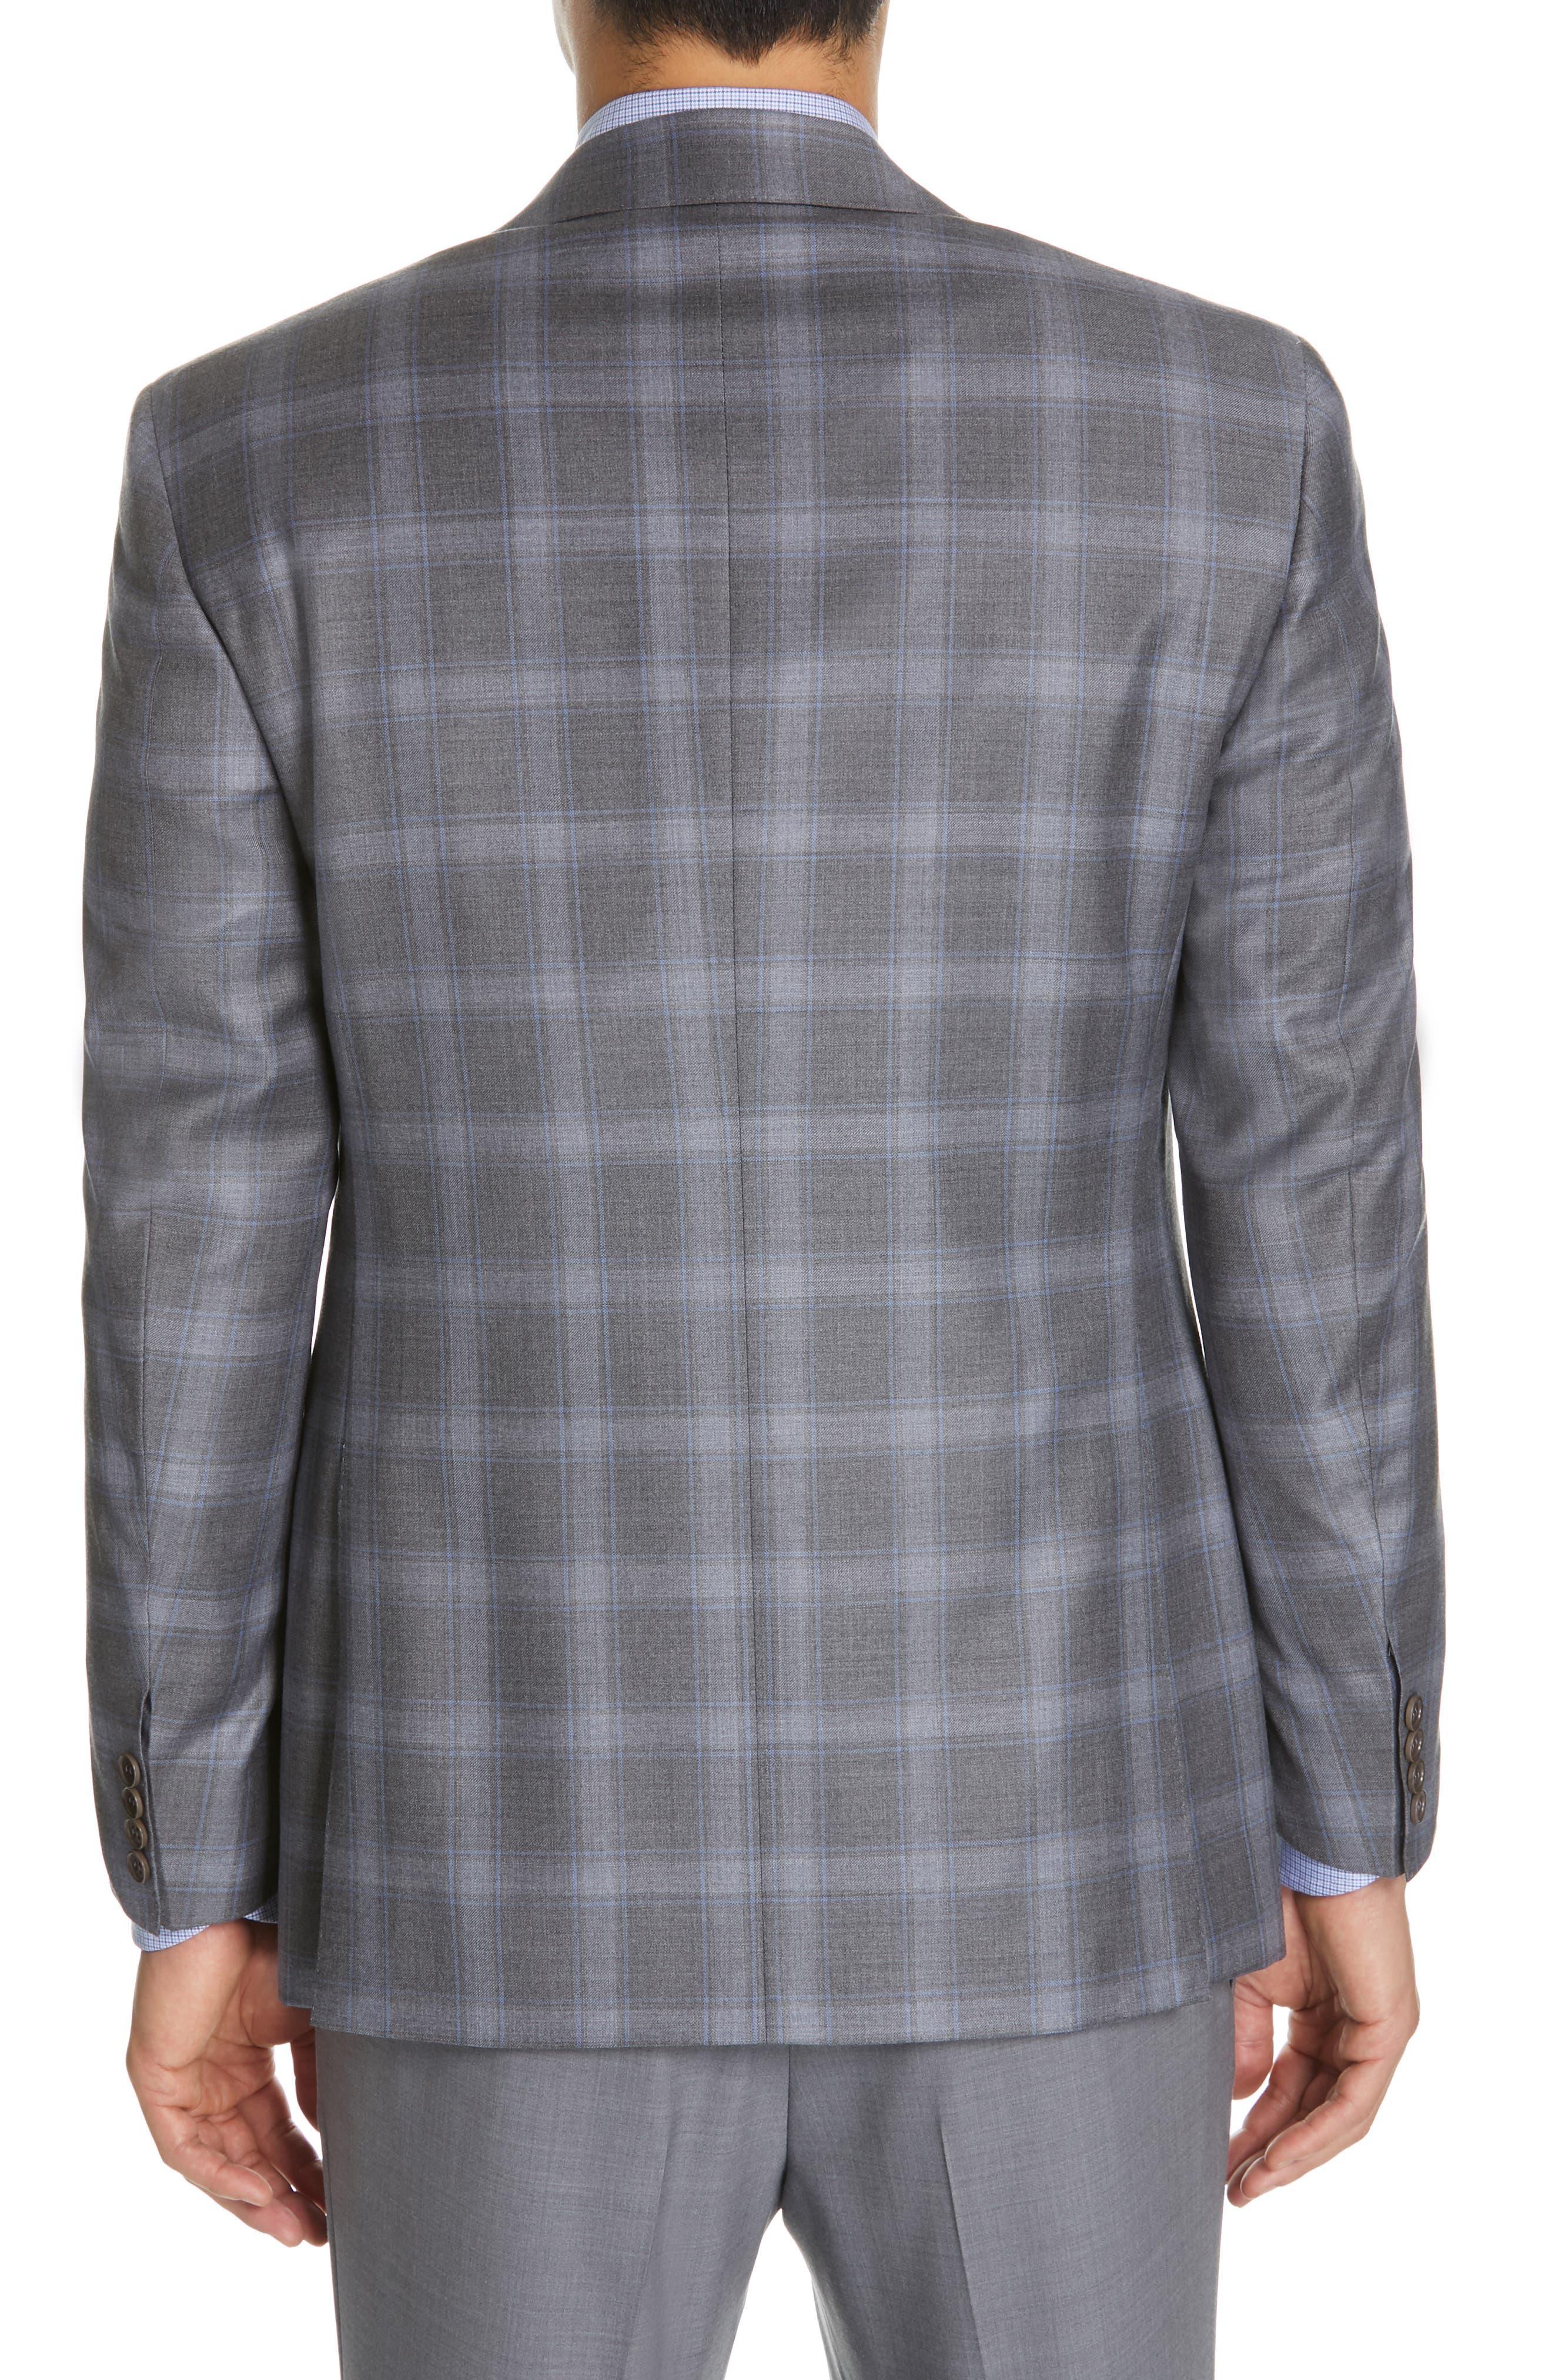 Sienna Classic Fit Plaid Wool Sport Coat,                             Alternate thumbnail 2, color,                             GREY